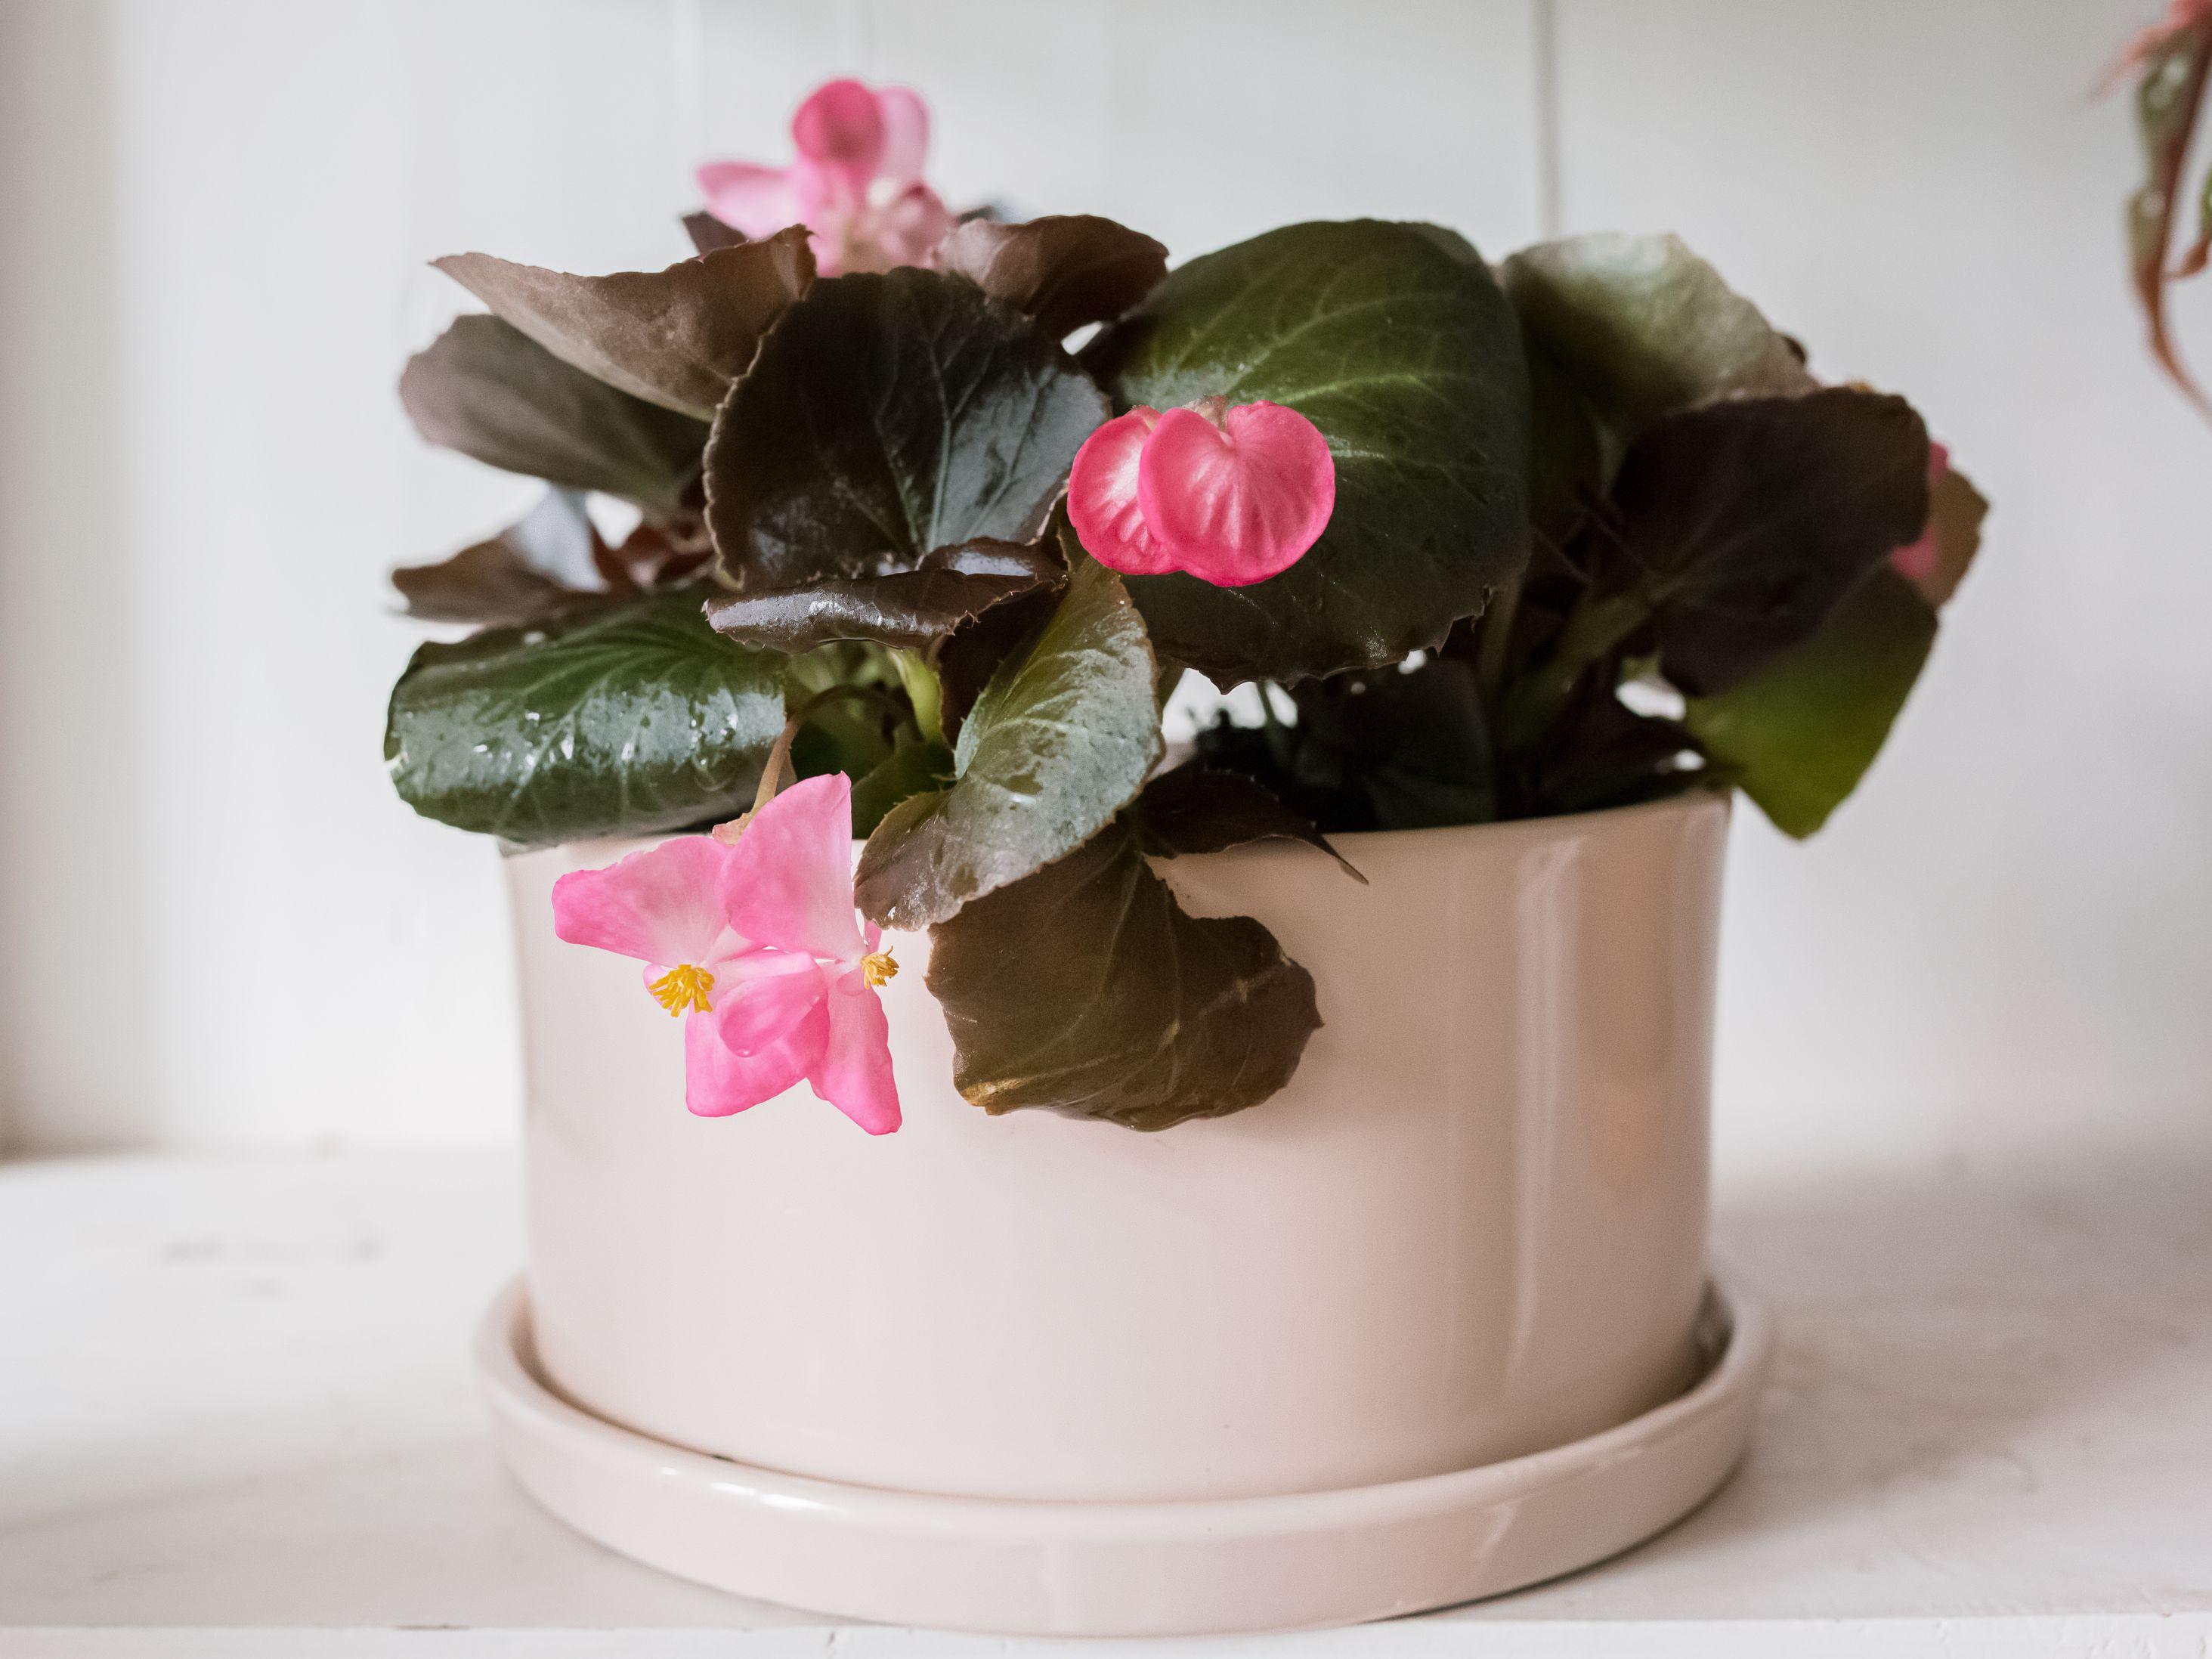 How To Grow Wax Begonias Semperflorens Indoors